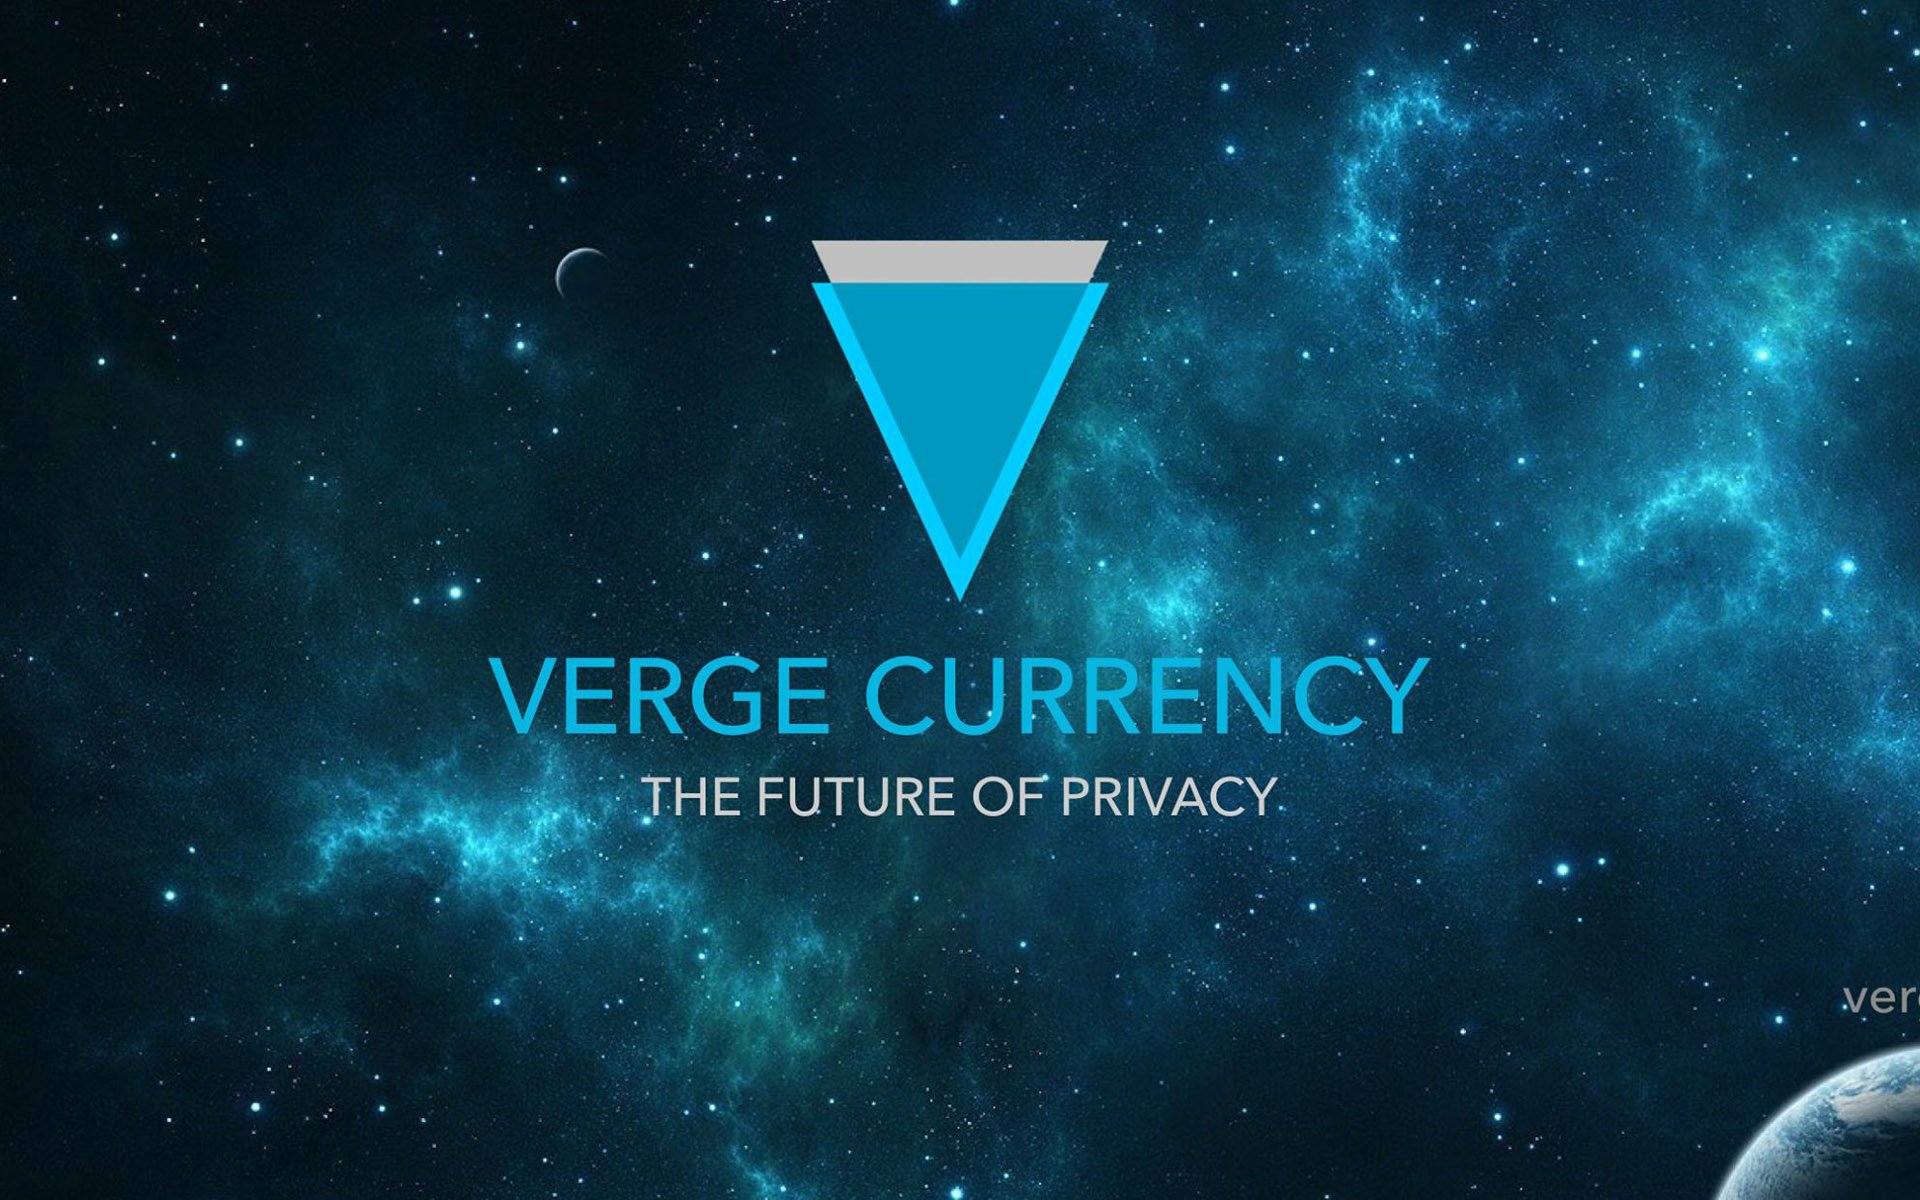 Verge - 'Penetrating the Market'